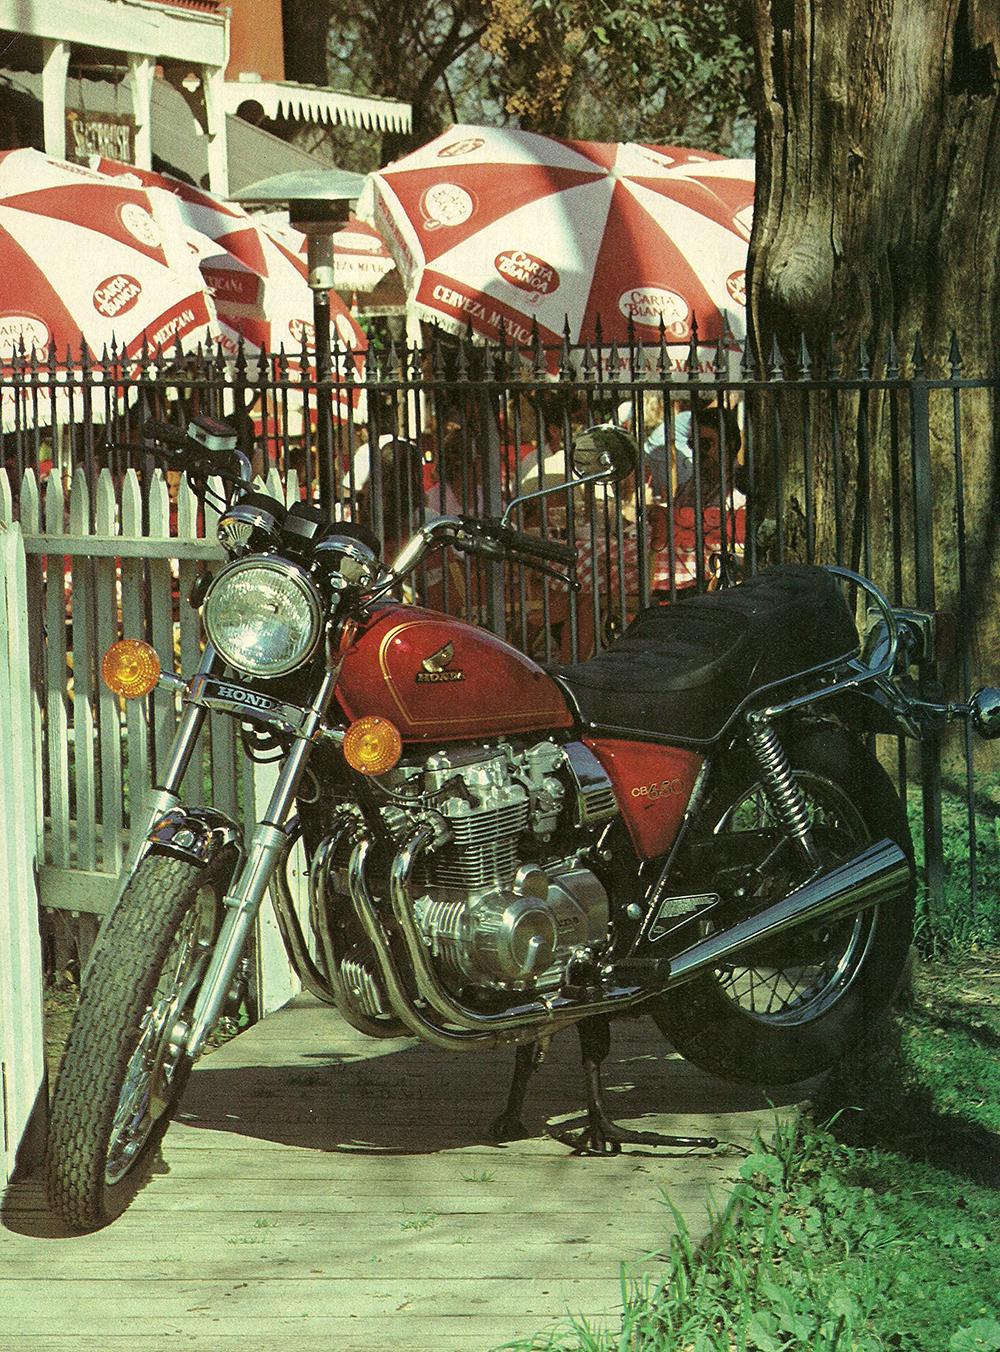 1980 Honda CB650 road test 01.jpg